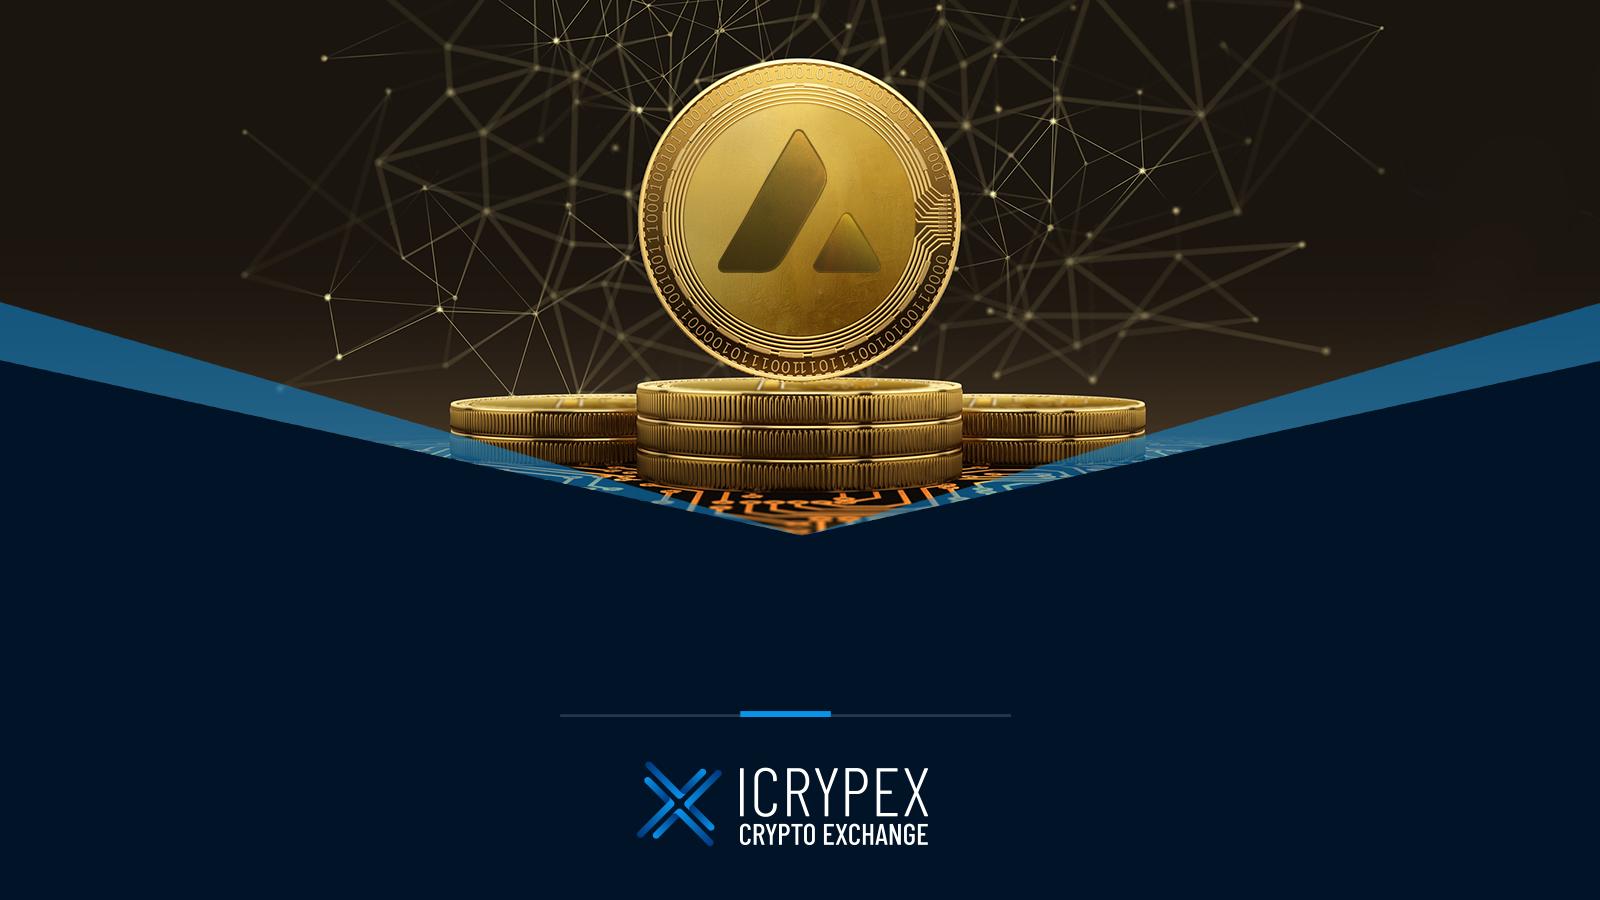 AVAX Türk Kripto Para Borsası Icrypex'te Listelendi